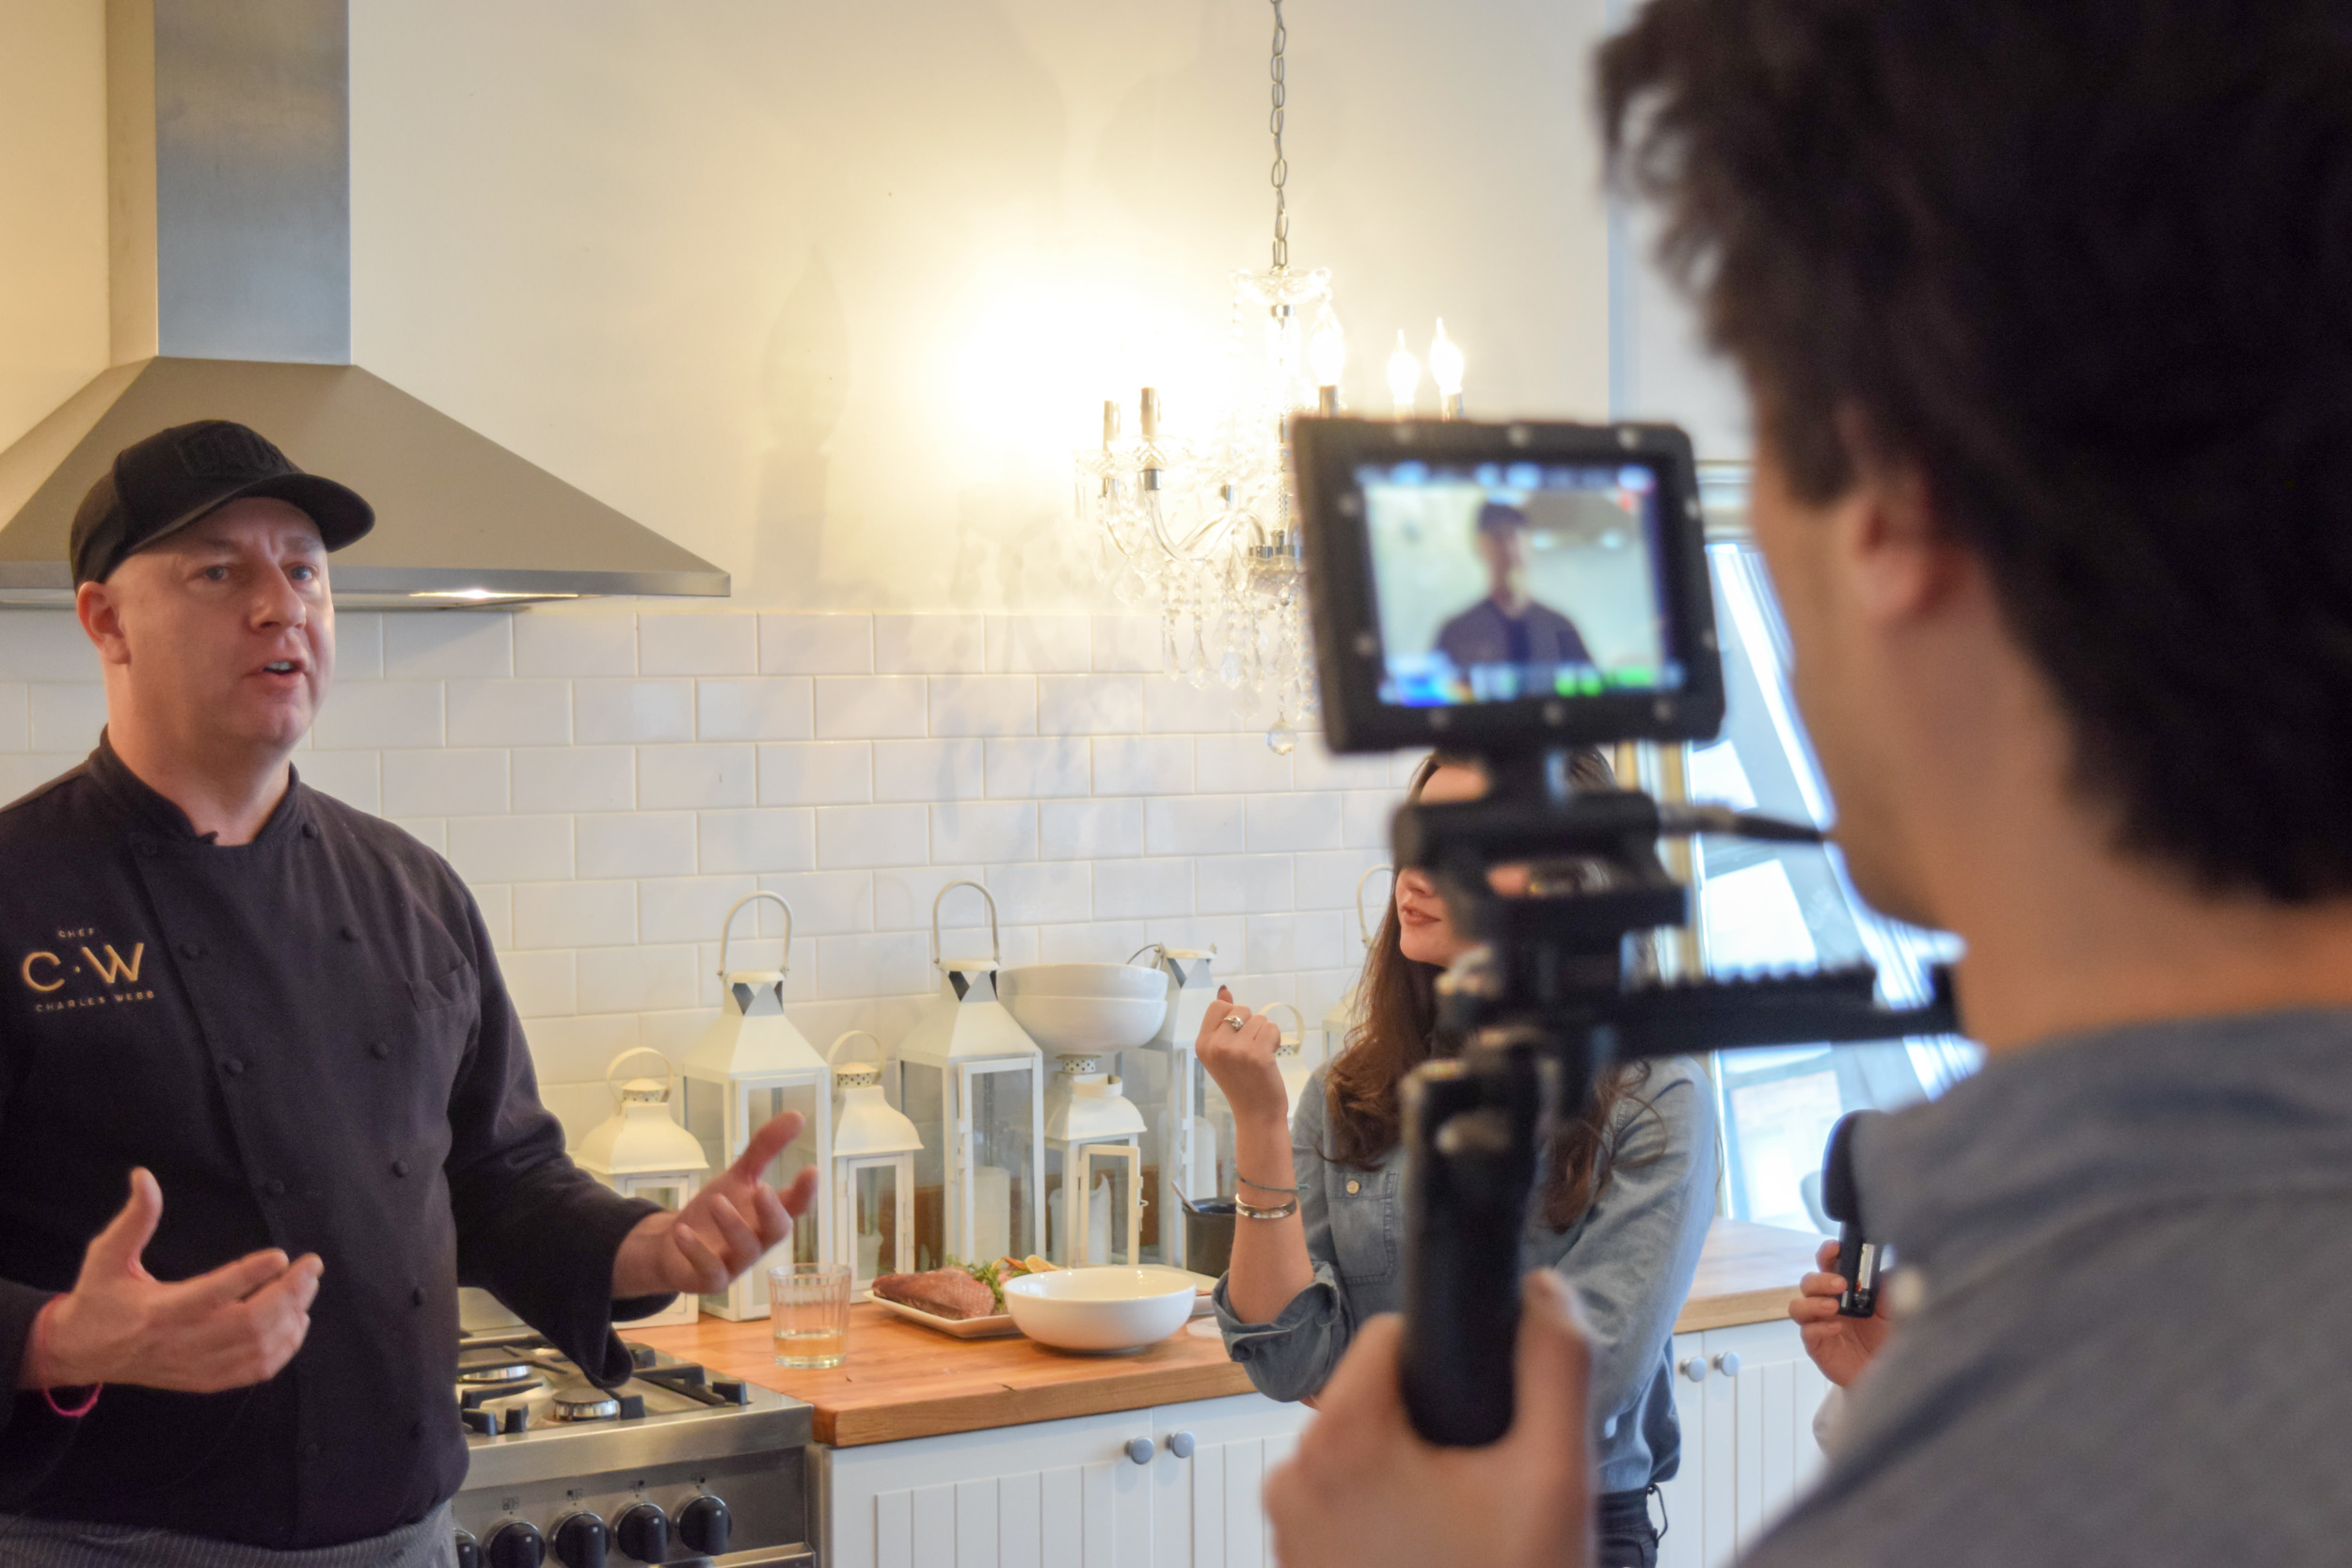 Eric Formato Formatografia photography Maura Gaughan Video Production Entreprenuership Charles Webb Chef Culinary Art -126.jpg